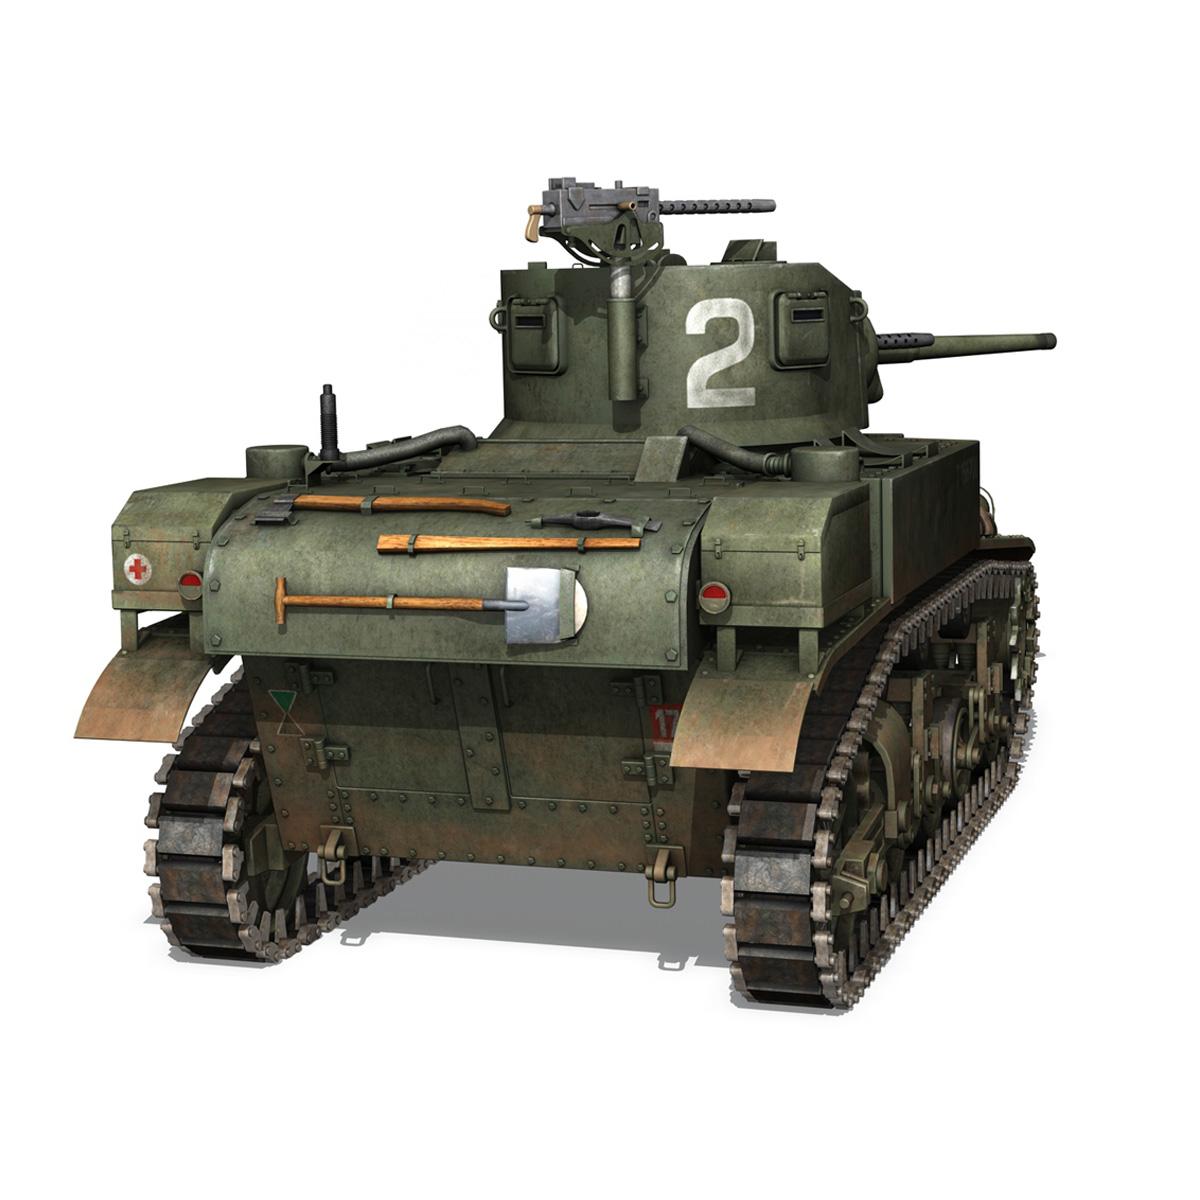 m3a1 light tank stuart – 156700 3d model c4d fbx lwo lw lws obj 3ds 265340